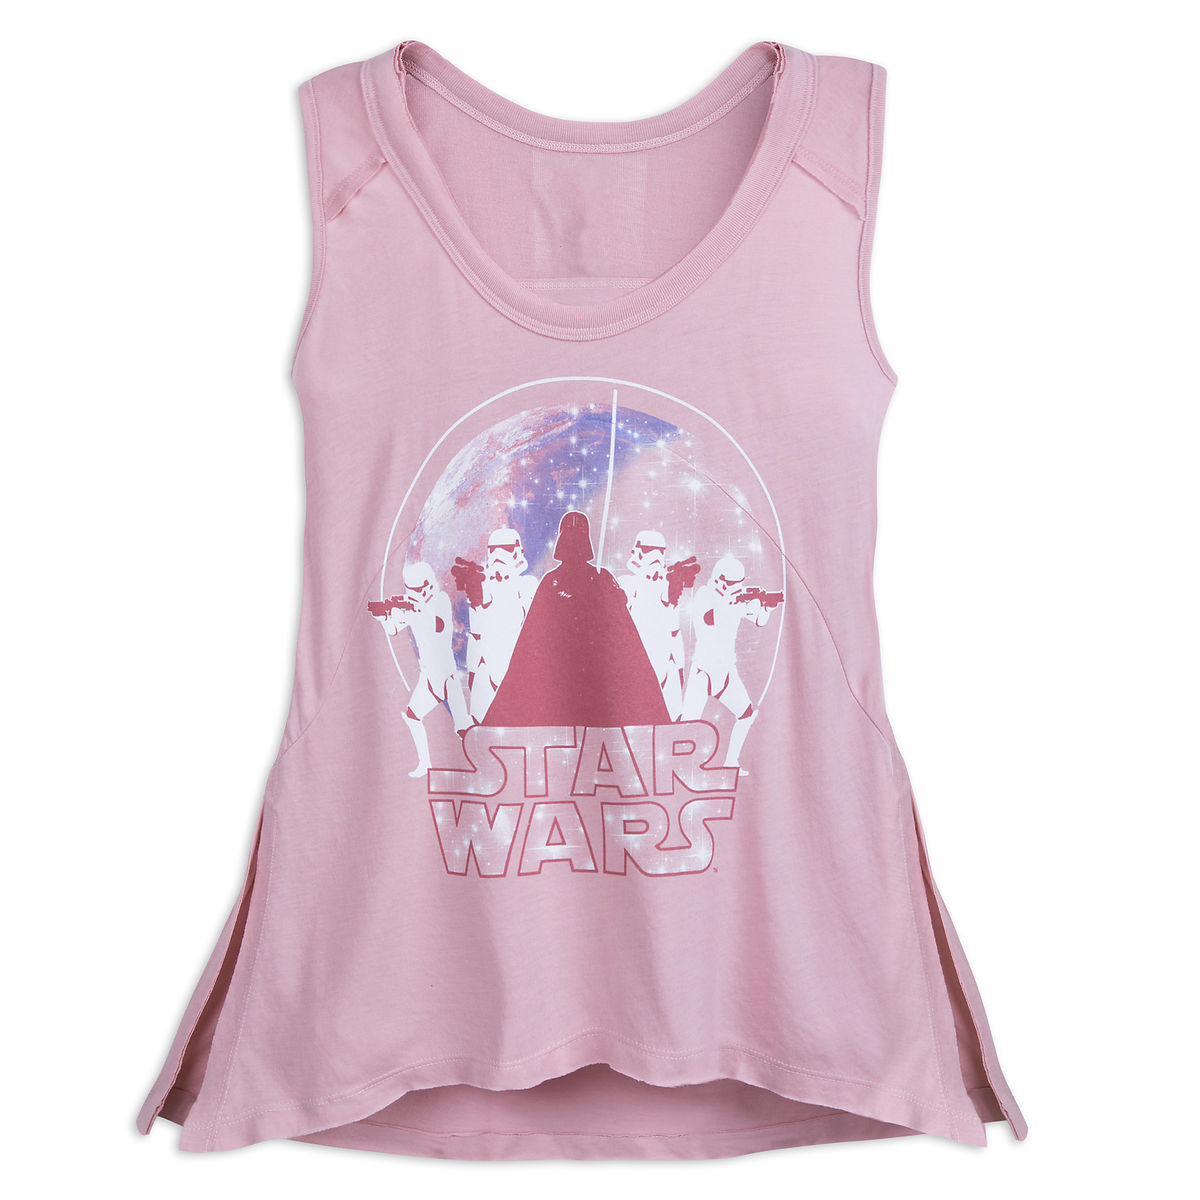 231d52b9580e24 Disney Tank Top for Women - Star Wars - Darth Vader - Pink